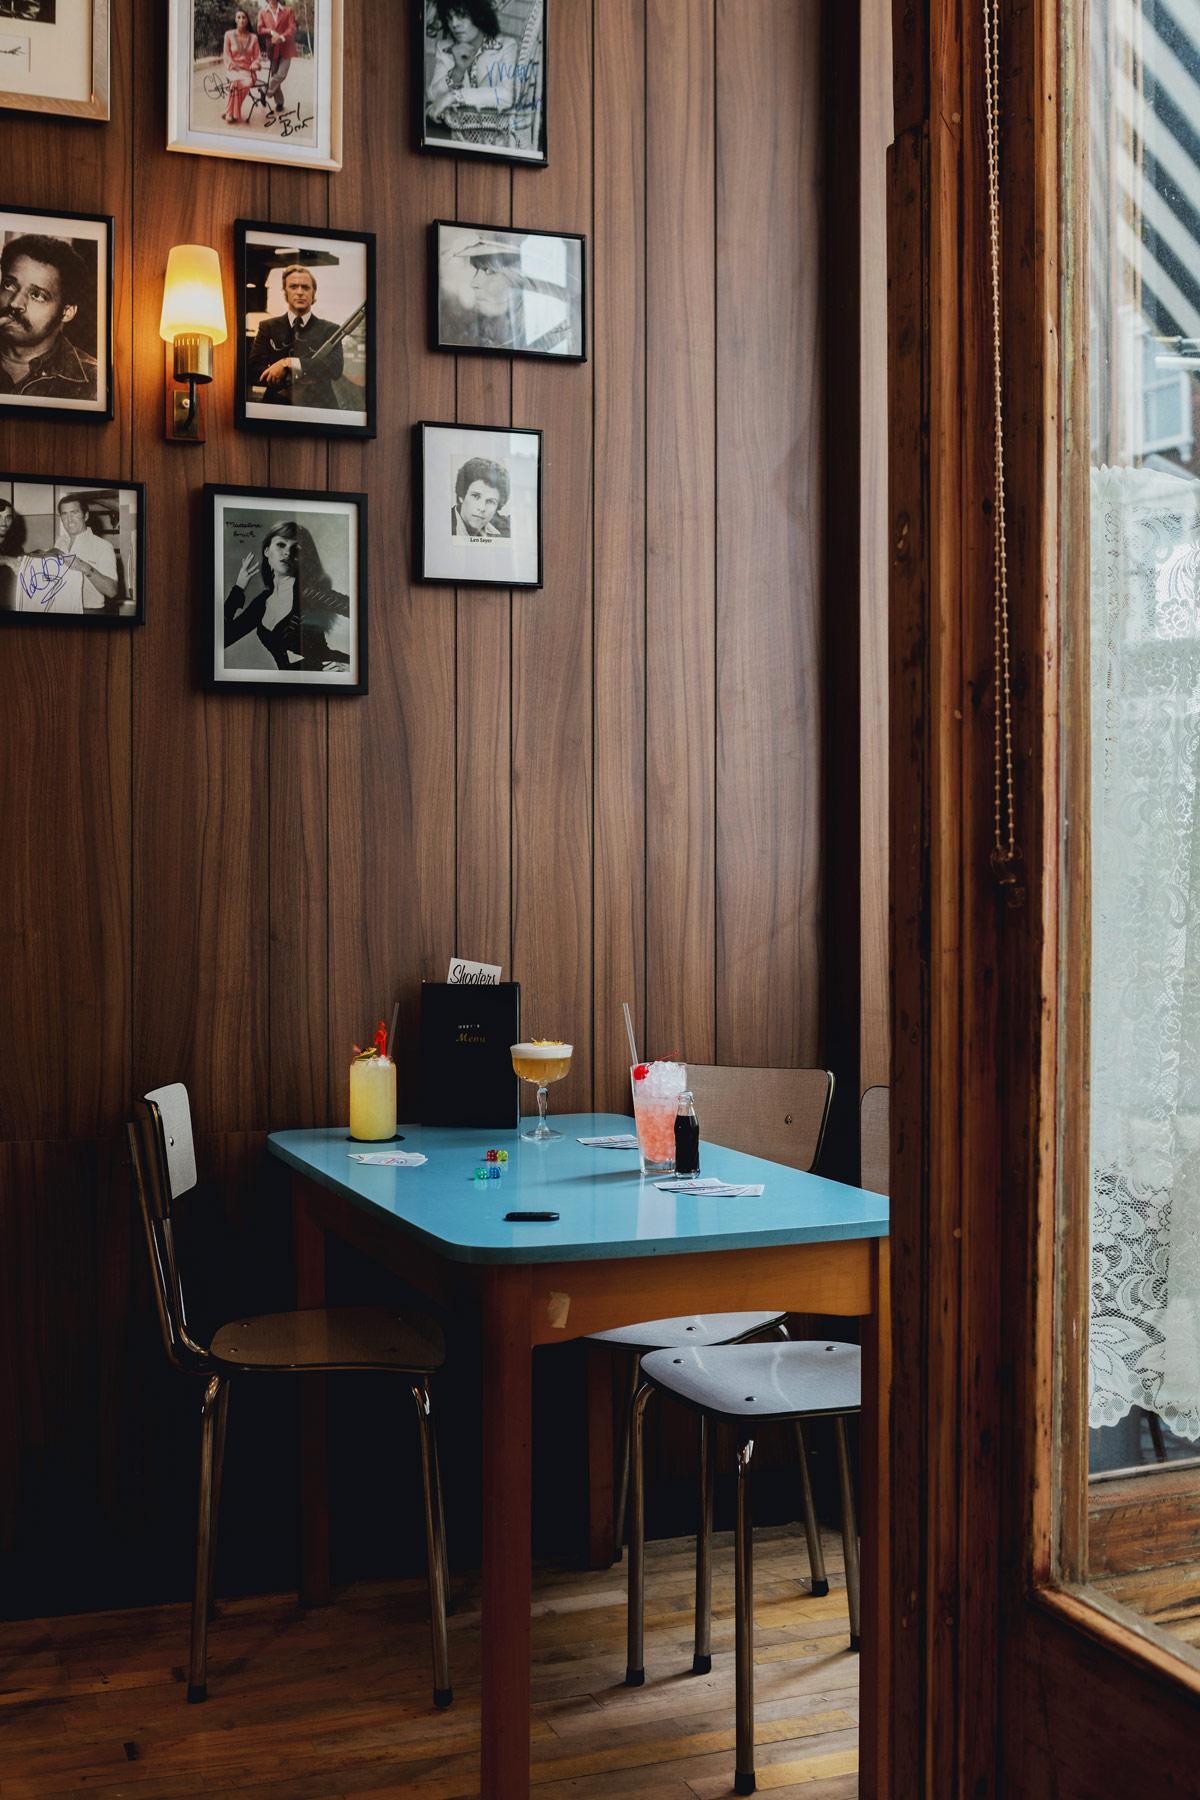 Fitzpatrick Hotel Restaurant Inside